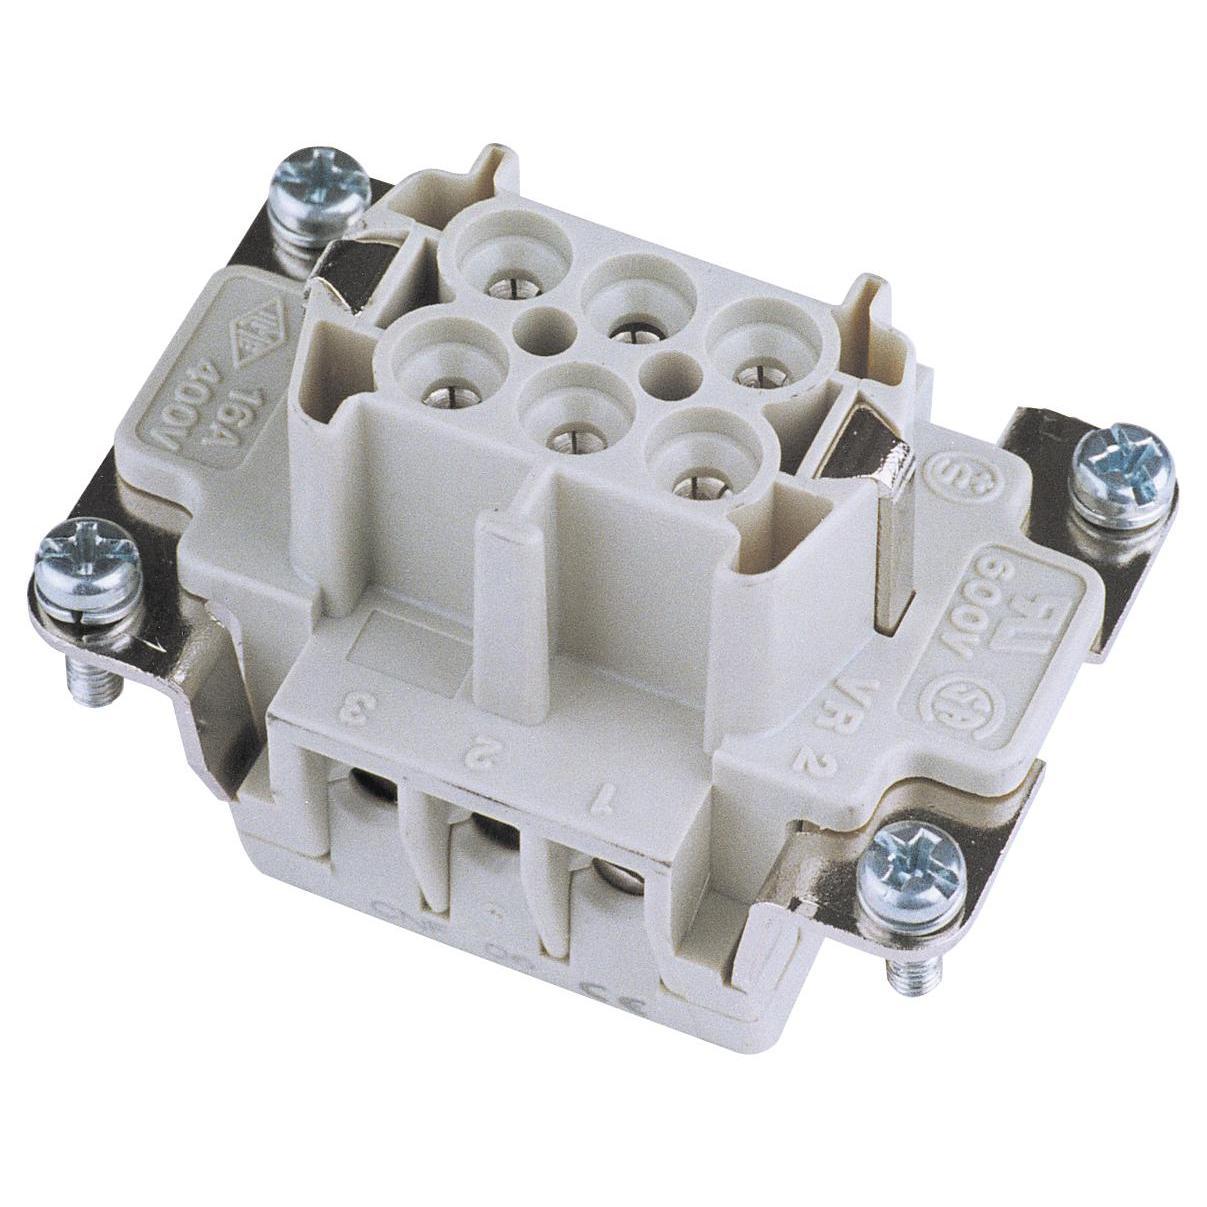 ILME Socket Insert 6-pin 16A, Screw Terminal